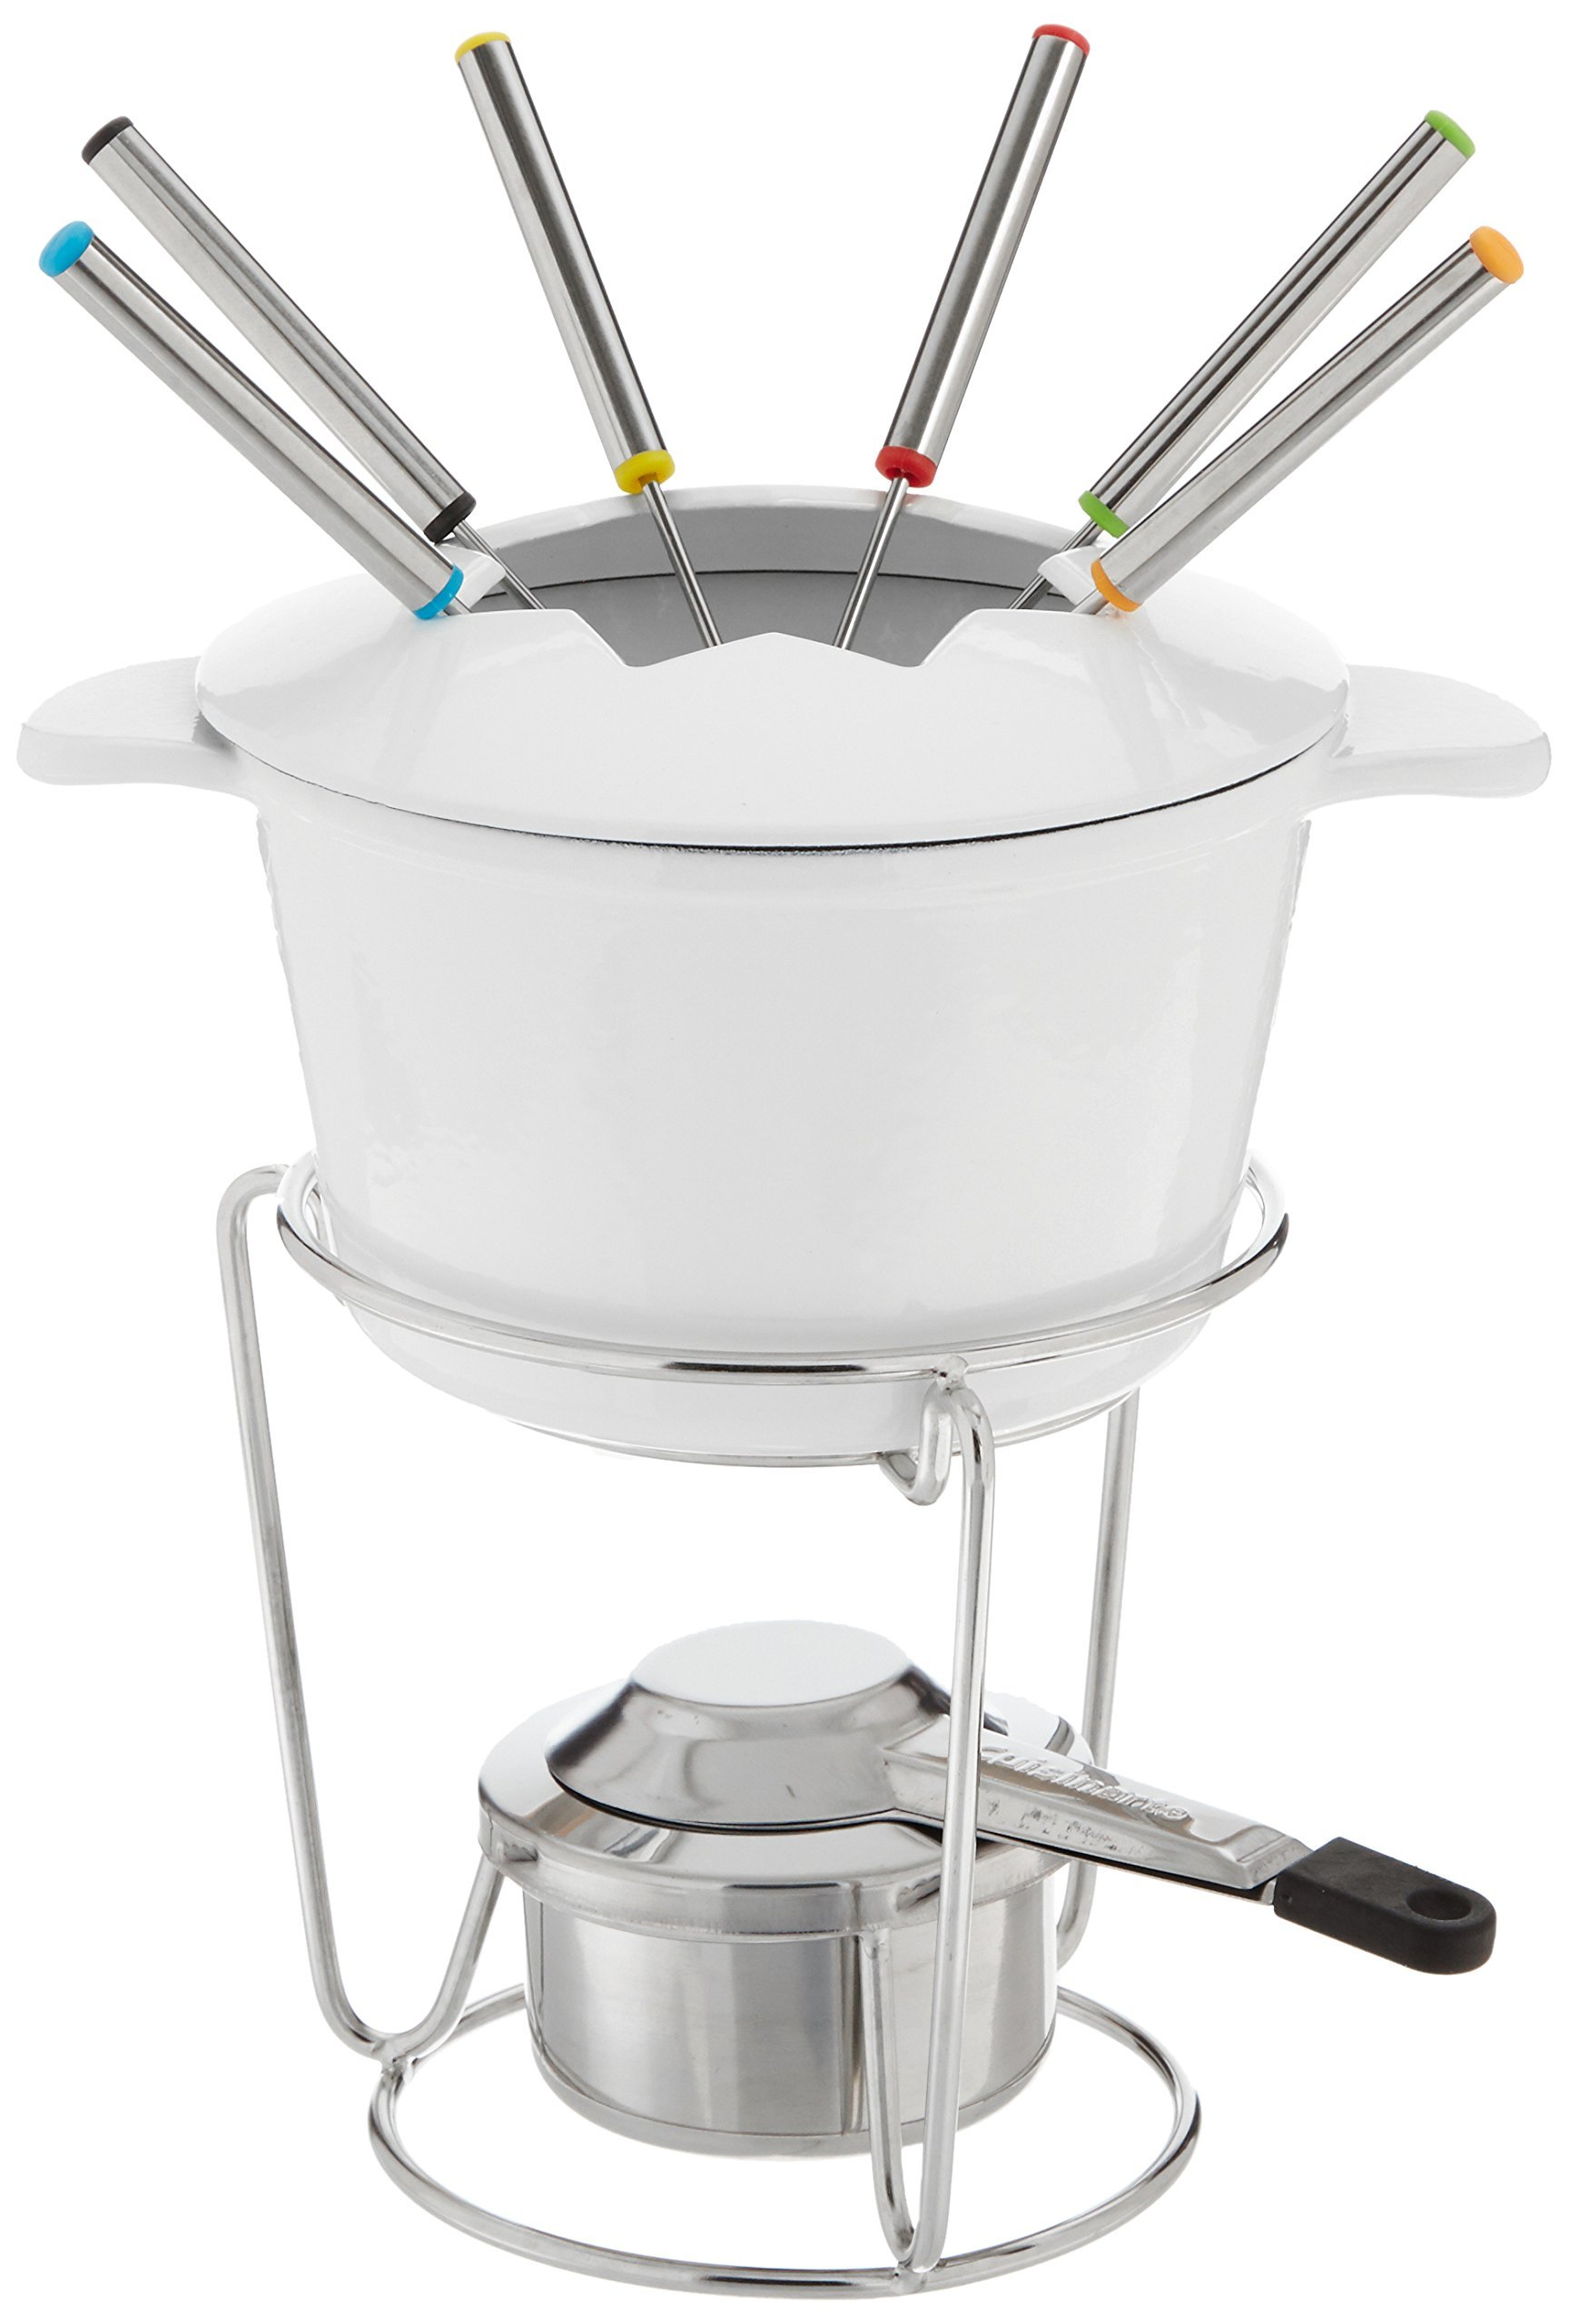 Cuisinart FP-115WS 13-Piece Cast Iron Fondue Set, White by Cuisinart (Image #1)